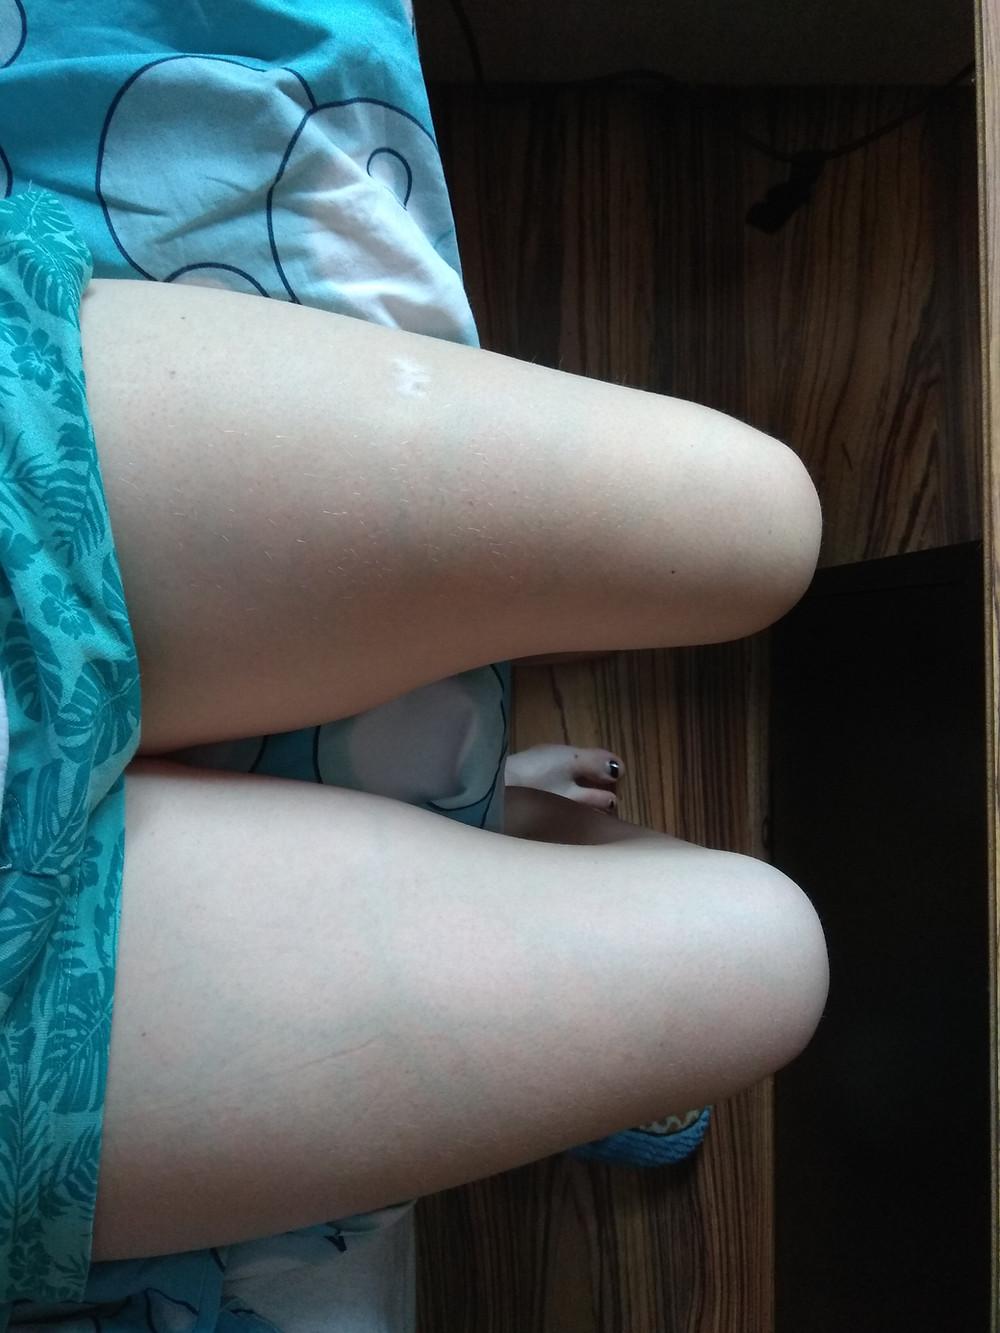 body image 46kg